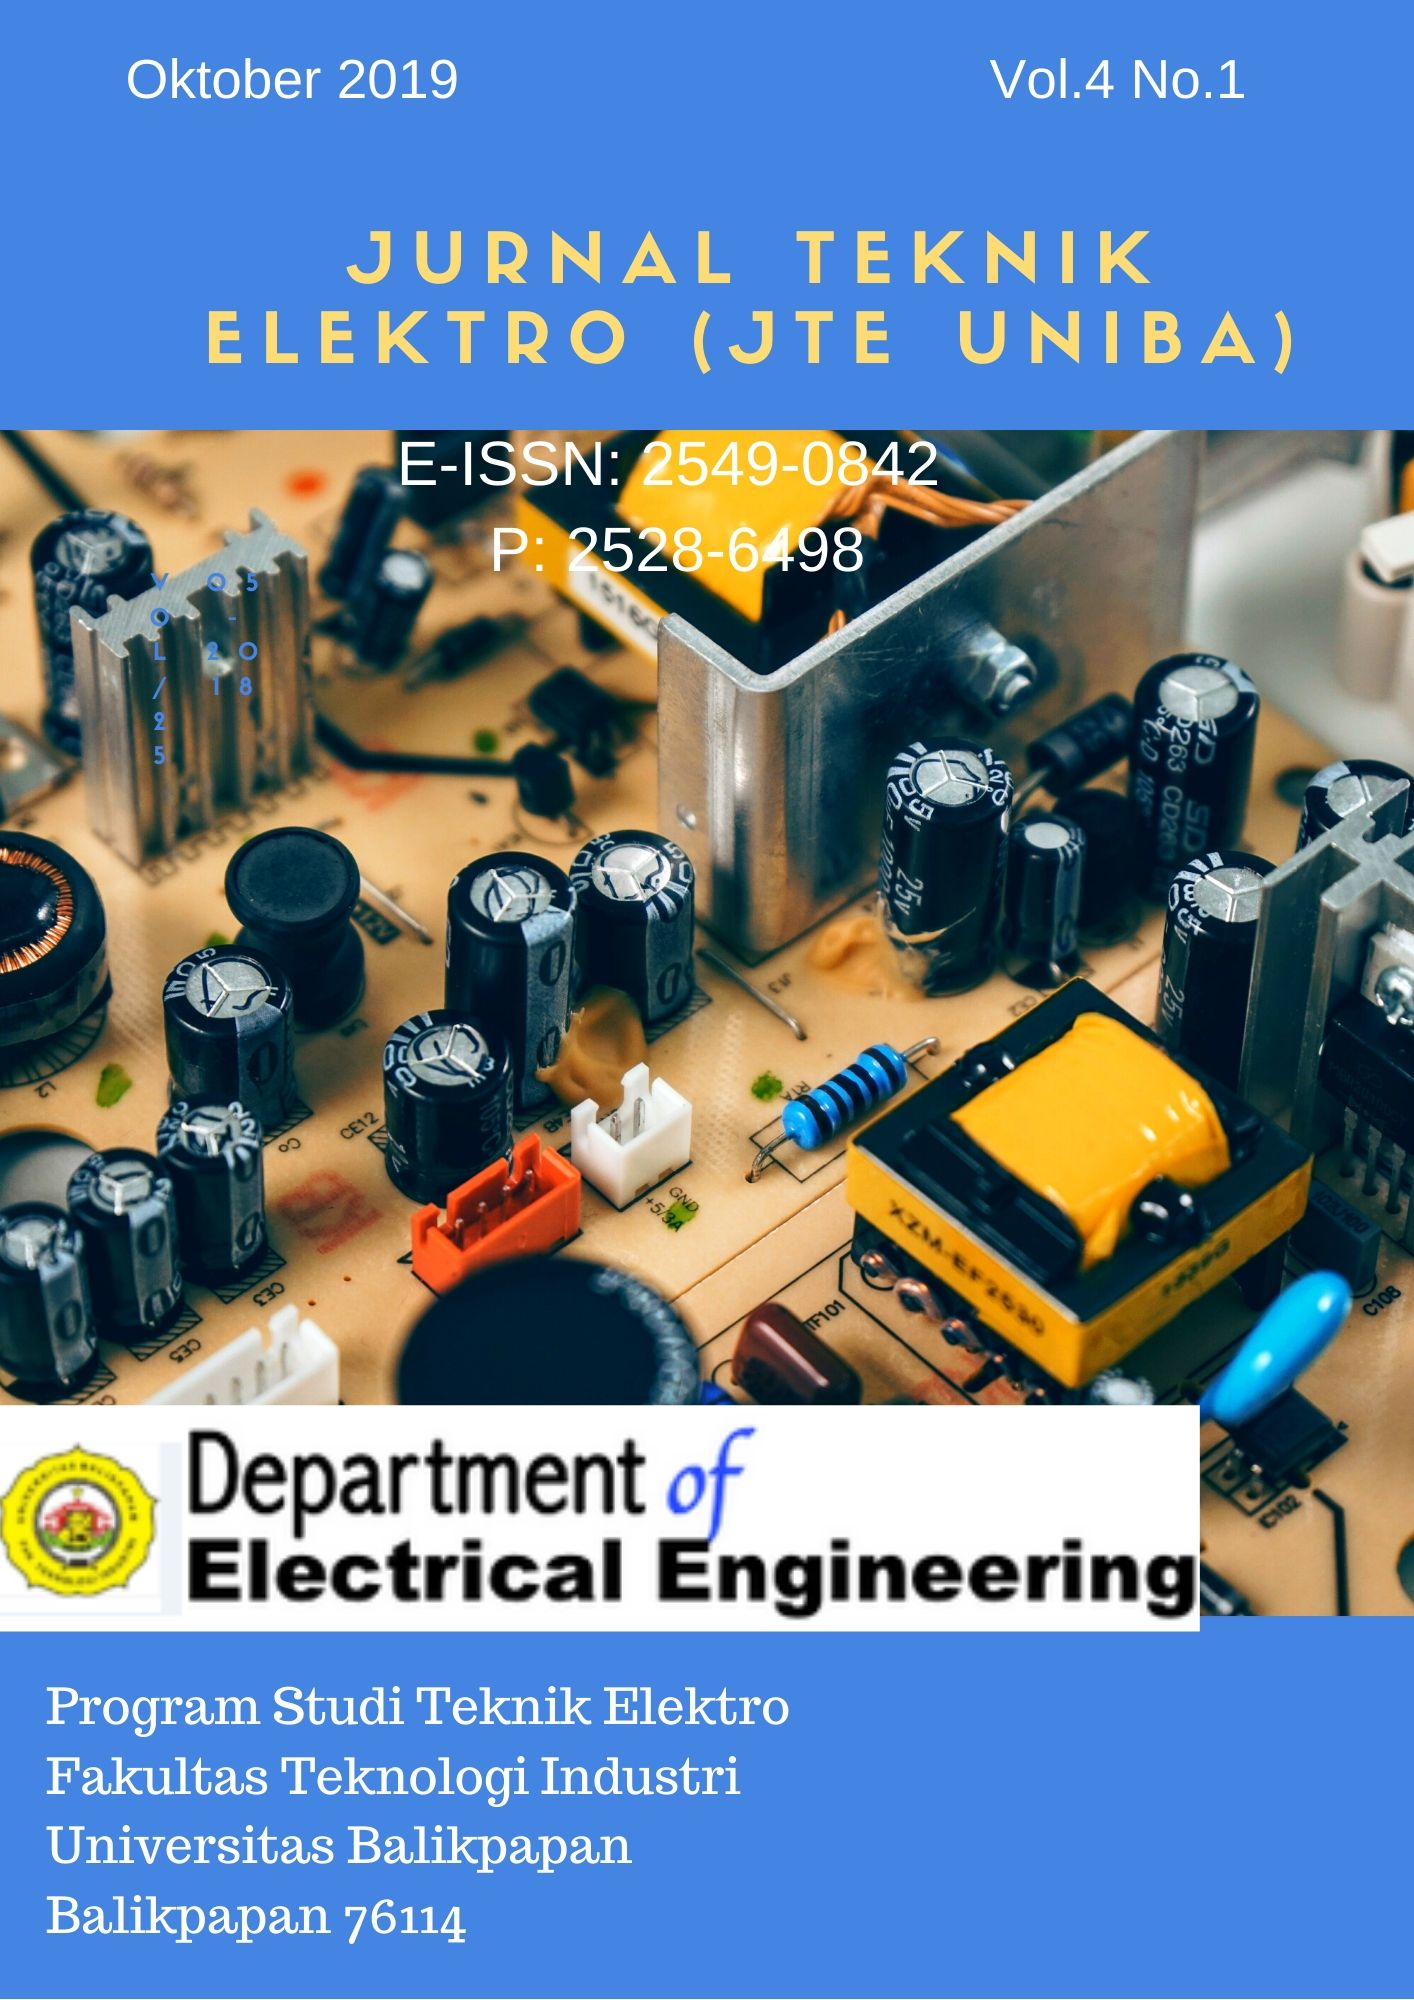 View Vol. 4 No. 1 (2019): Vol 4 No 1 (2019): JTE UNIBA (Jurnal Teknik Elektro Uniba)